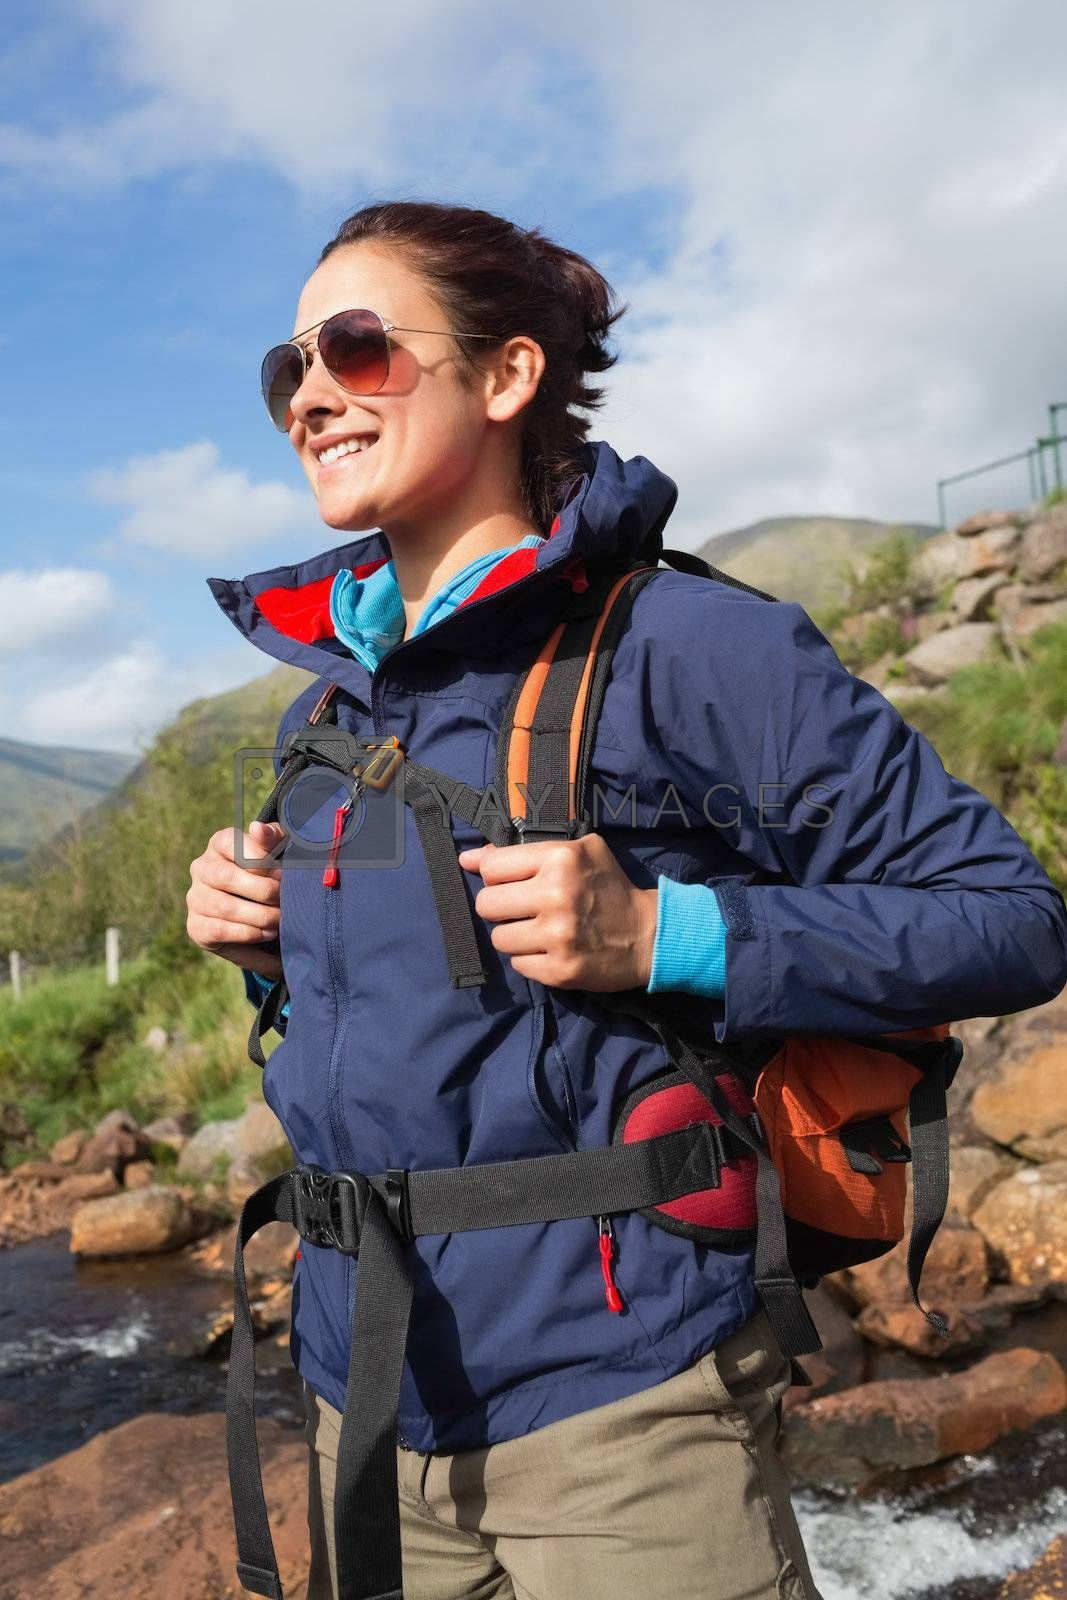 Brunette wearing rain jacket and sunglasses smiling by Wavebreakmedia